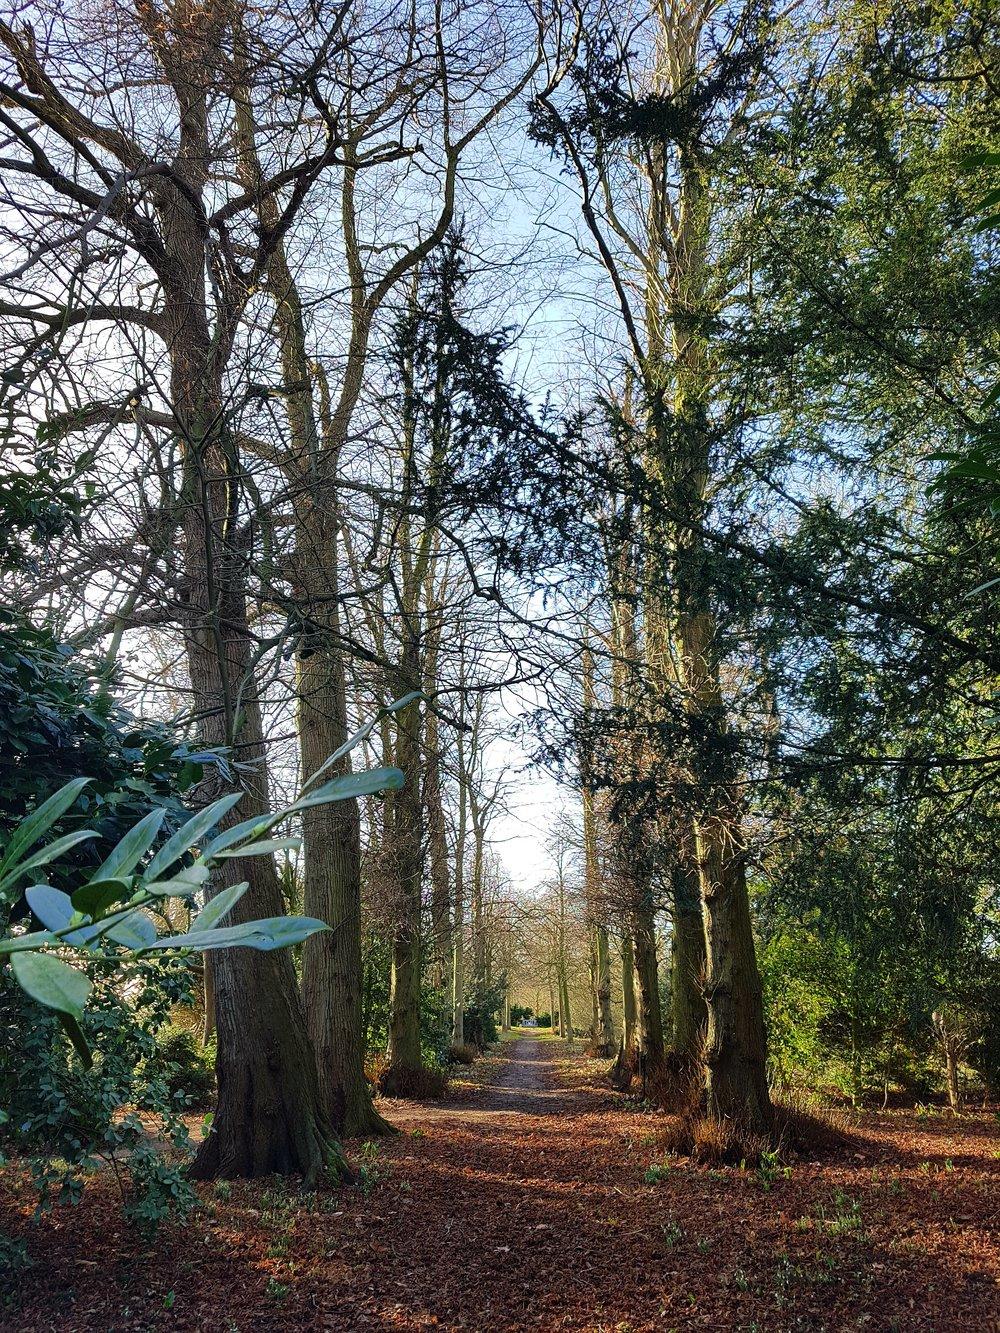 The Wilderness avenue